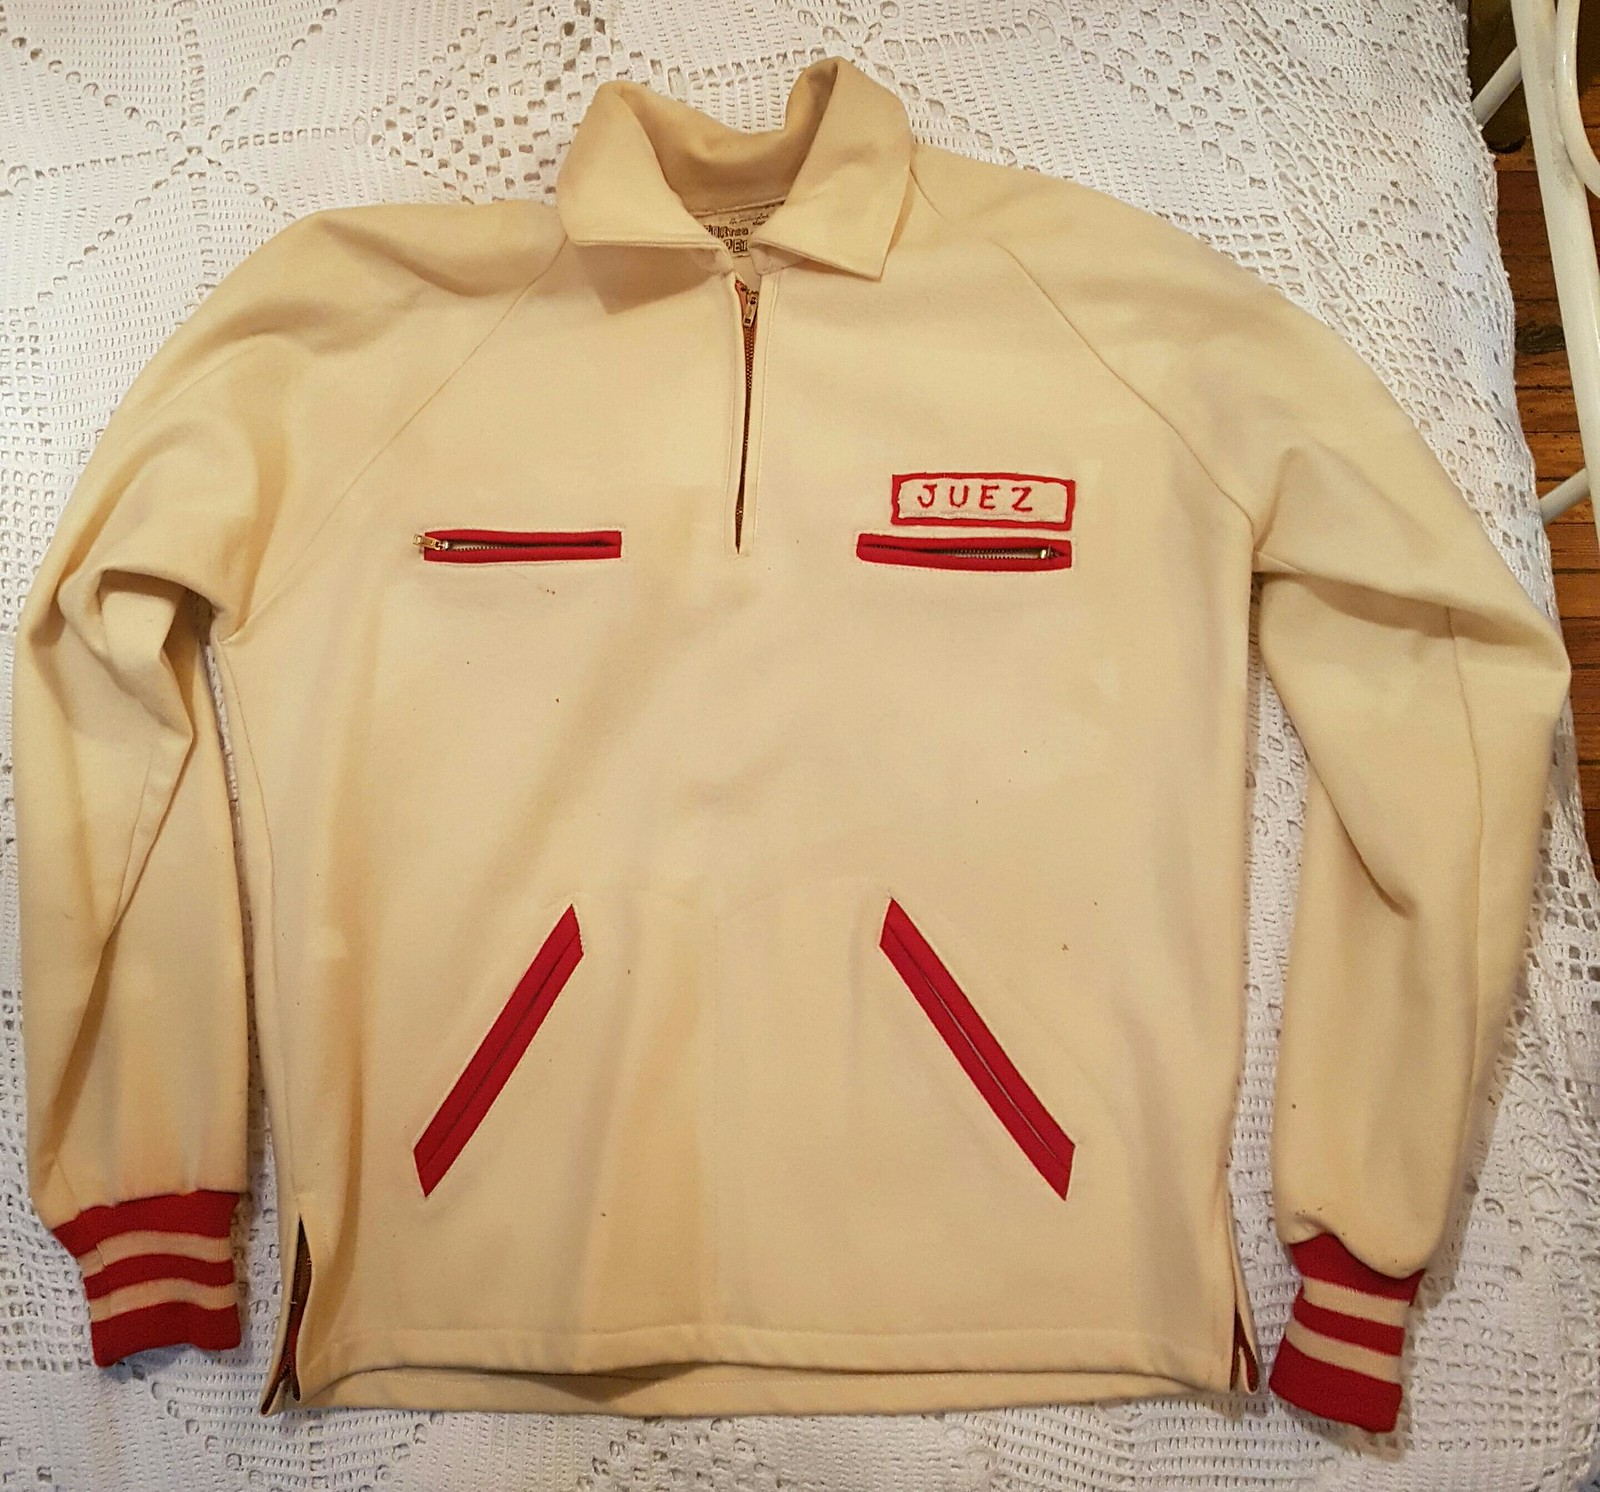 on sale 22b75 92478 Womens Eagles Shirts Modells